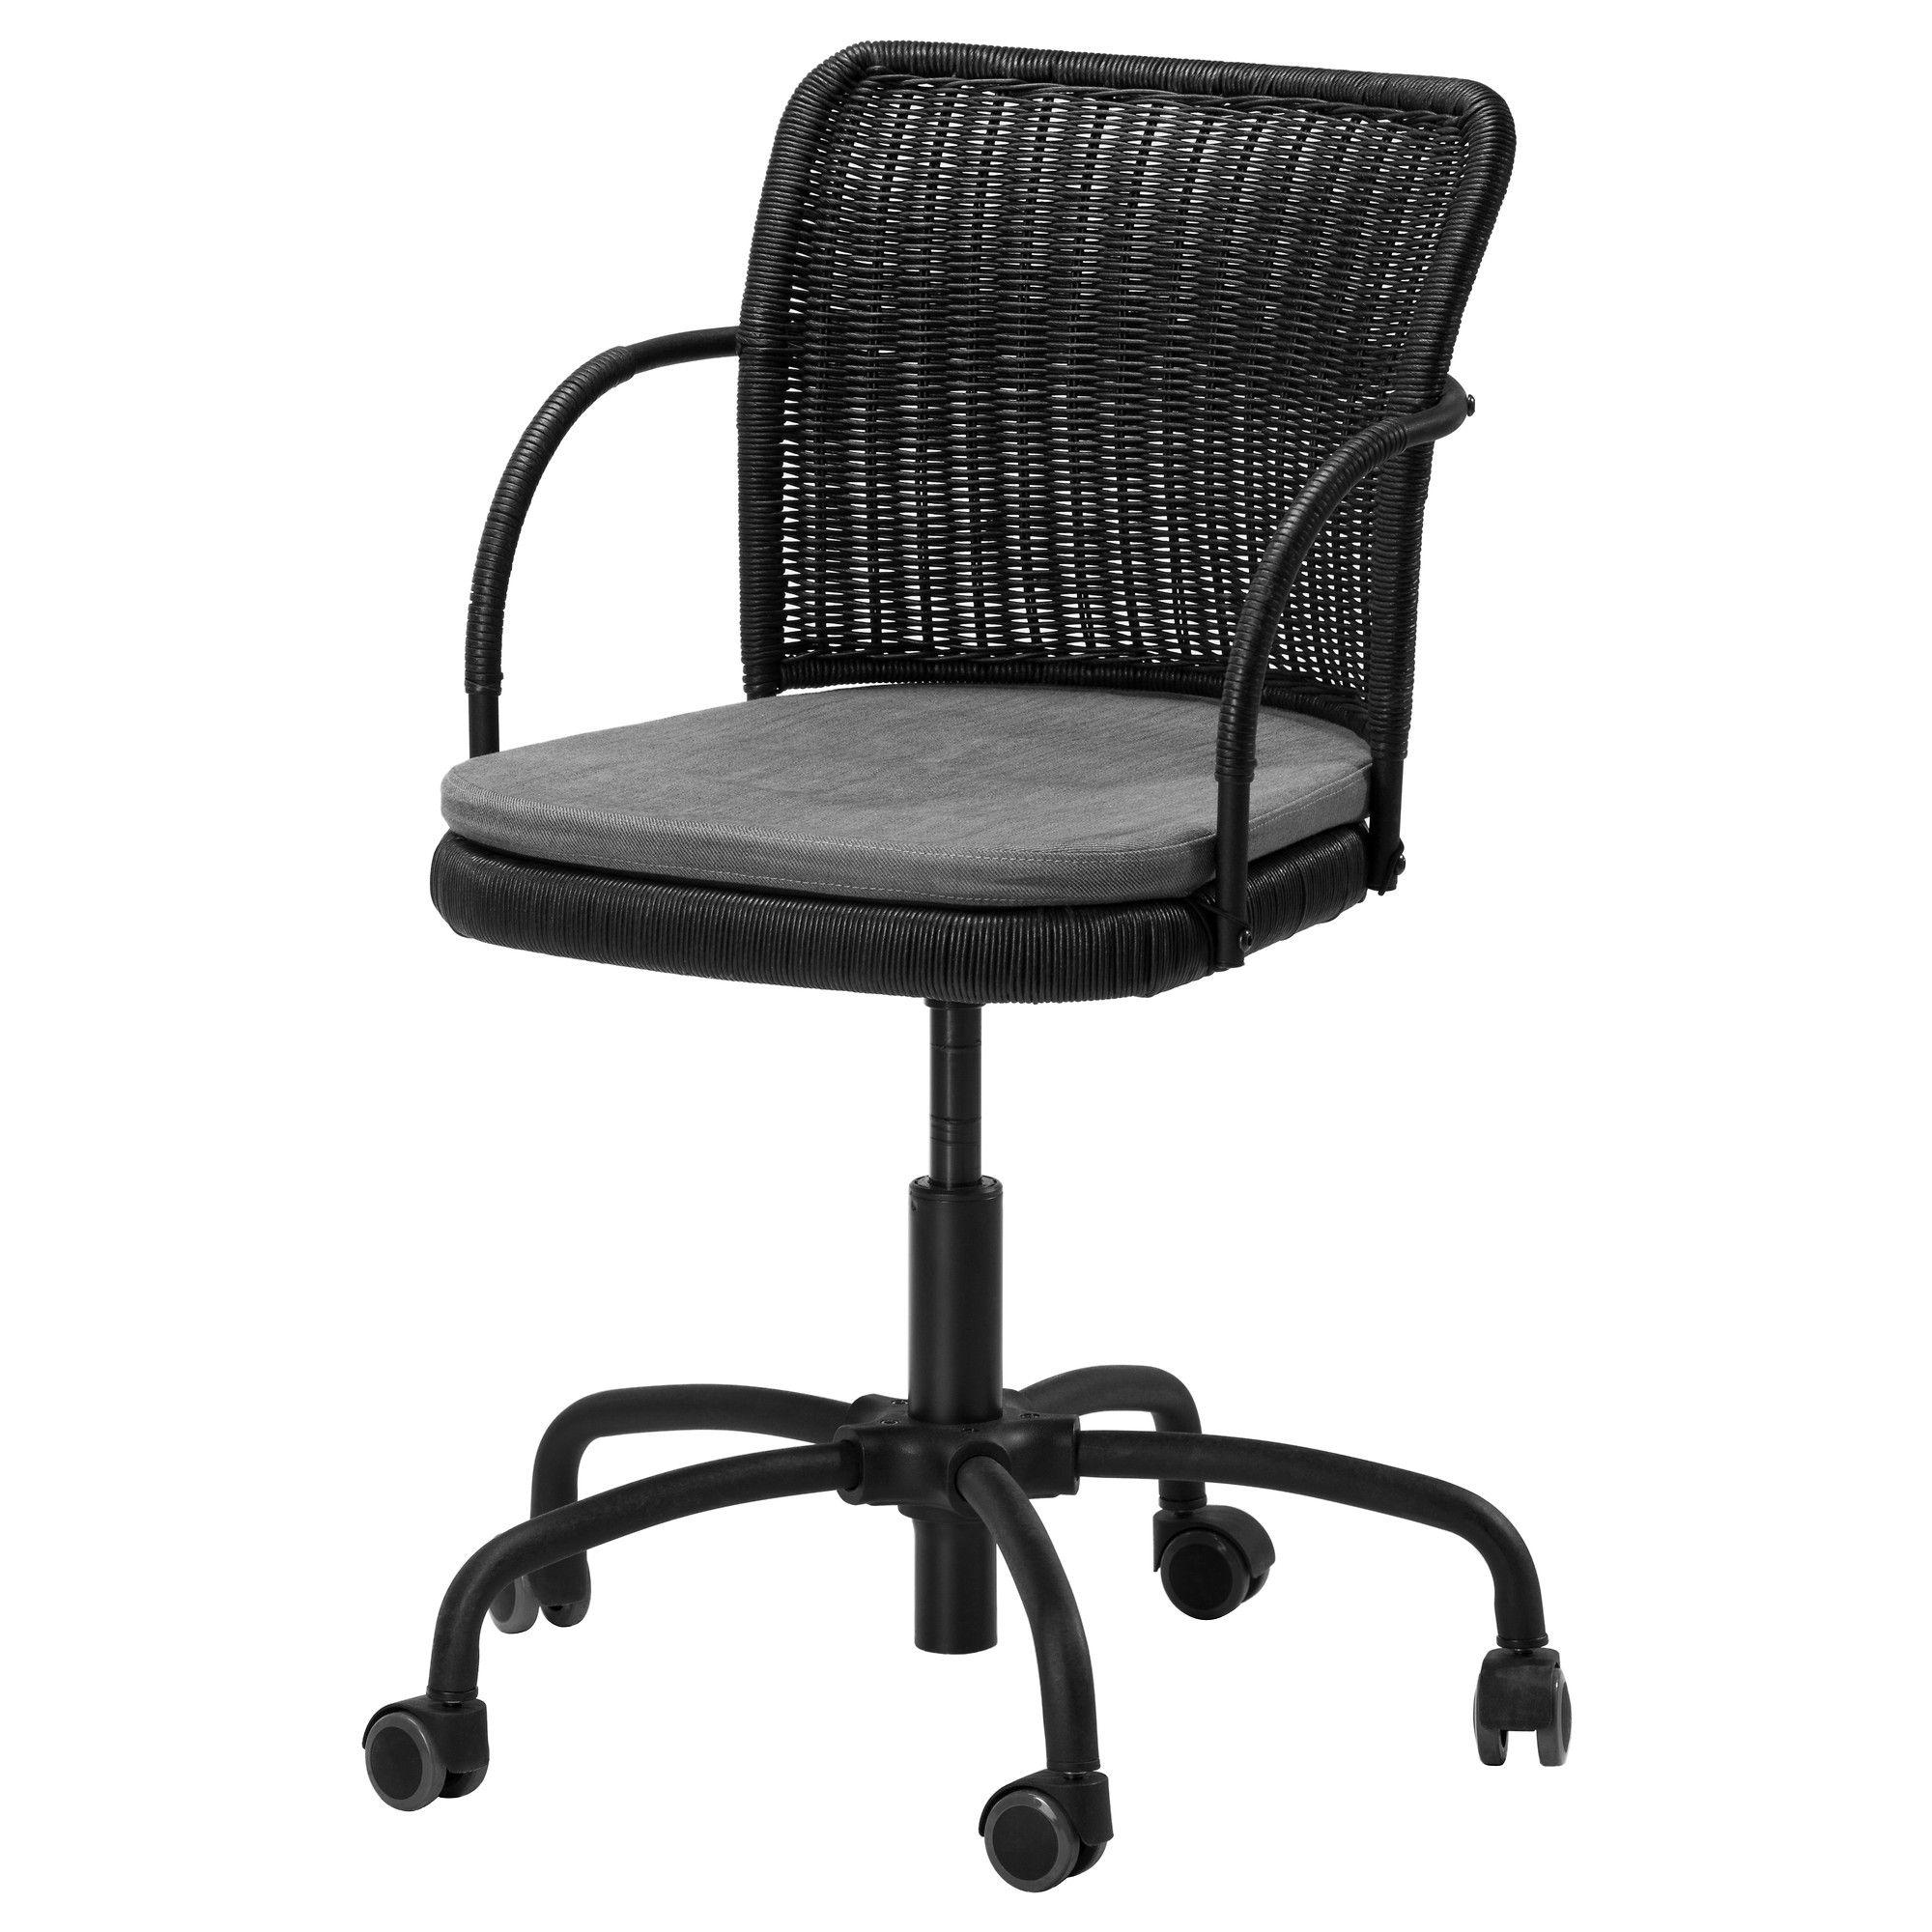 desk chair ikea pro beach low slung folding gregor swivel black svanby gray 100 nail